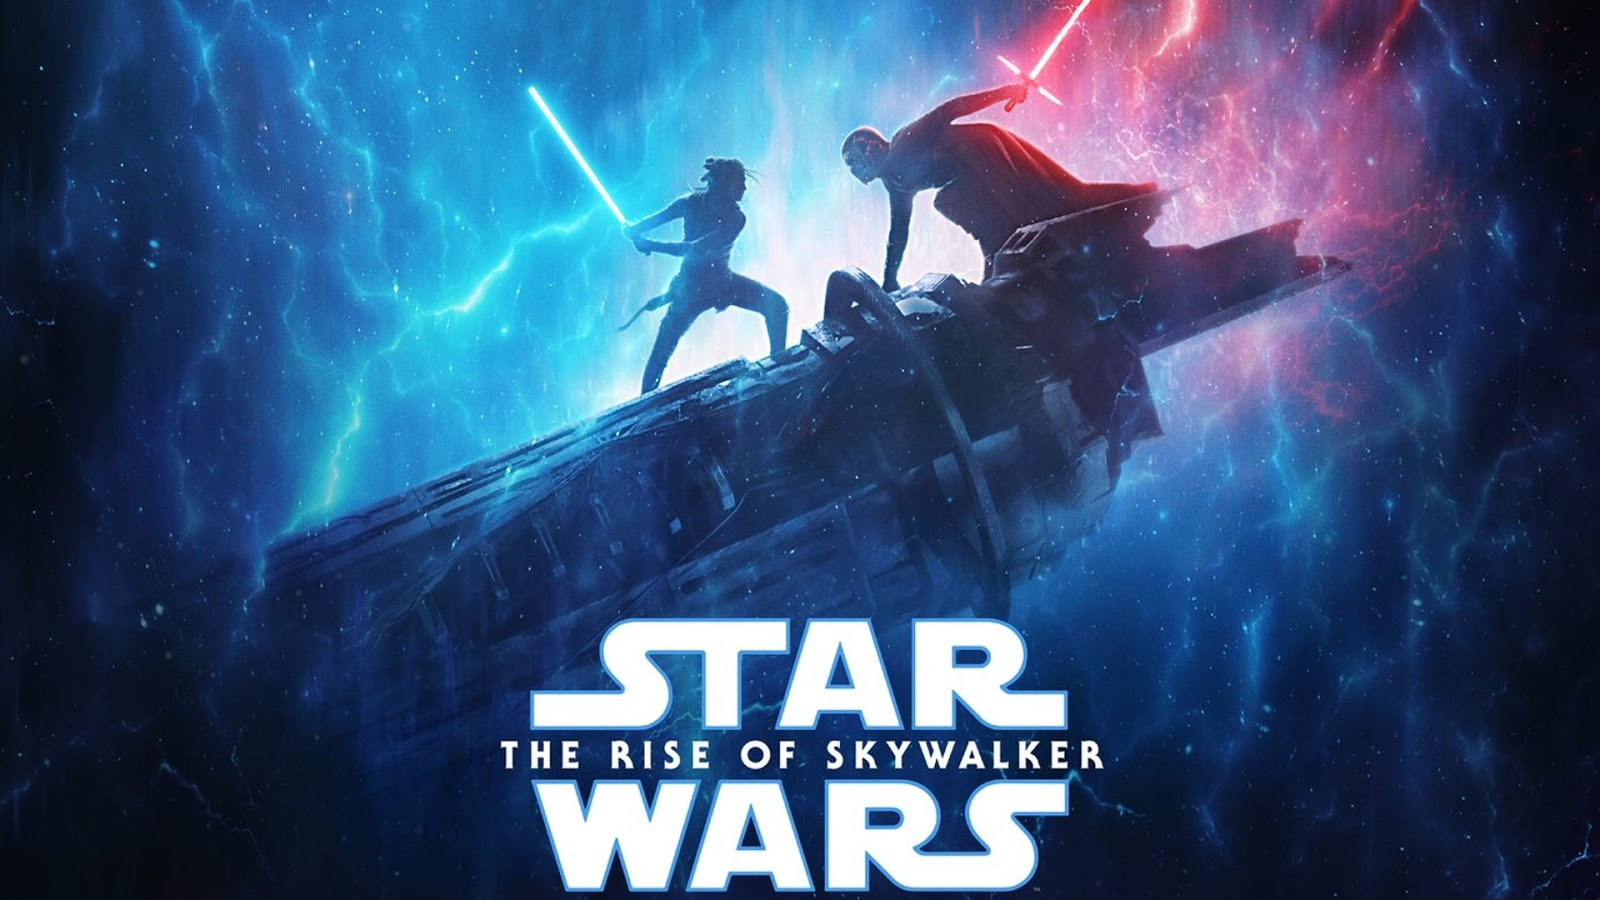 Star Wars 9: John Boyega likes it better than Star Wars 8